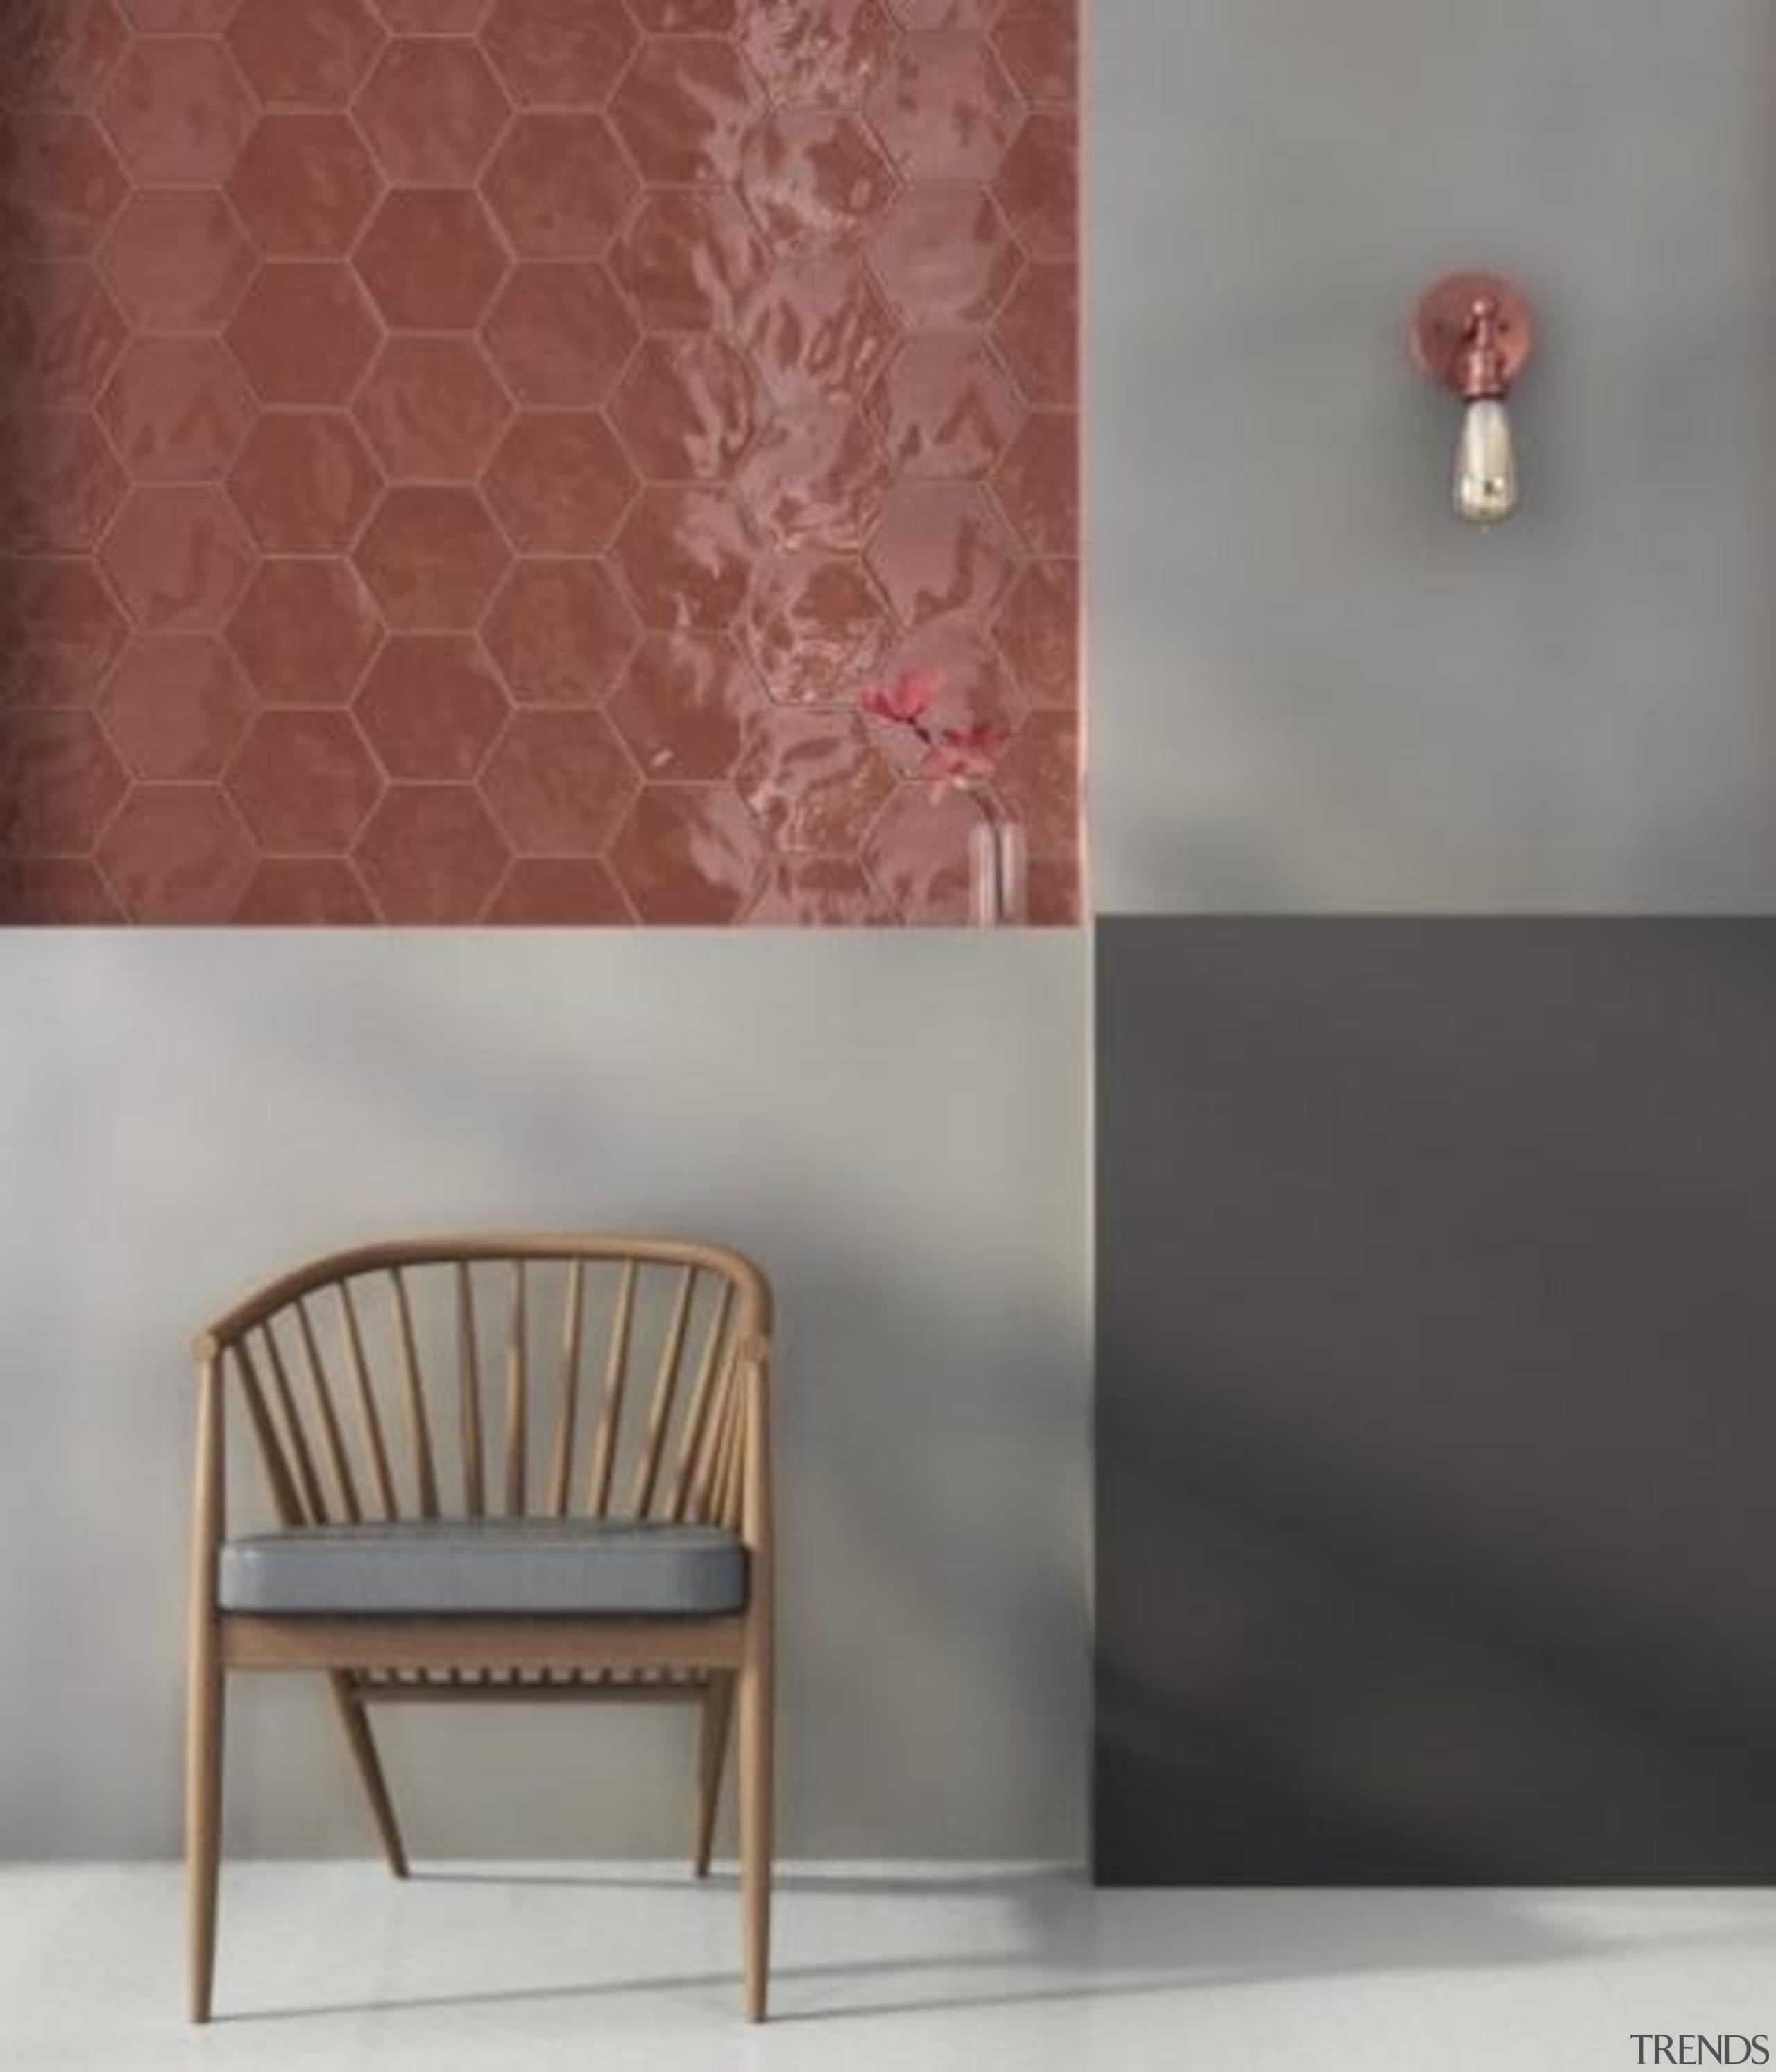 Hexa Wall Cherry Pie Gloss 173x150 - Hexa floor, furniture, interior design, product, wall, gray, red